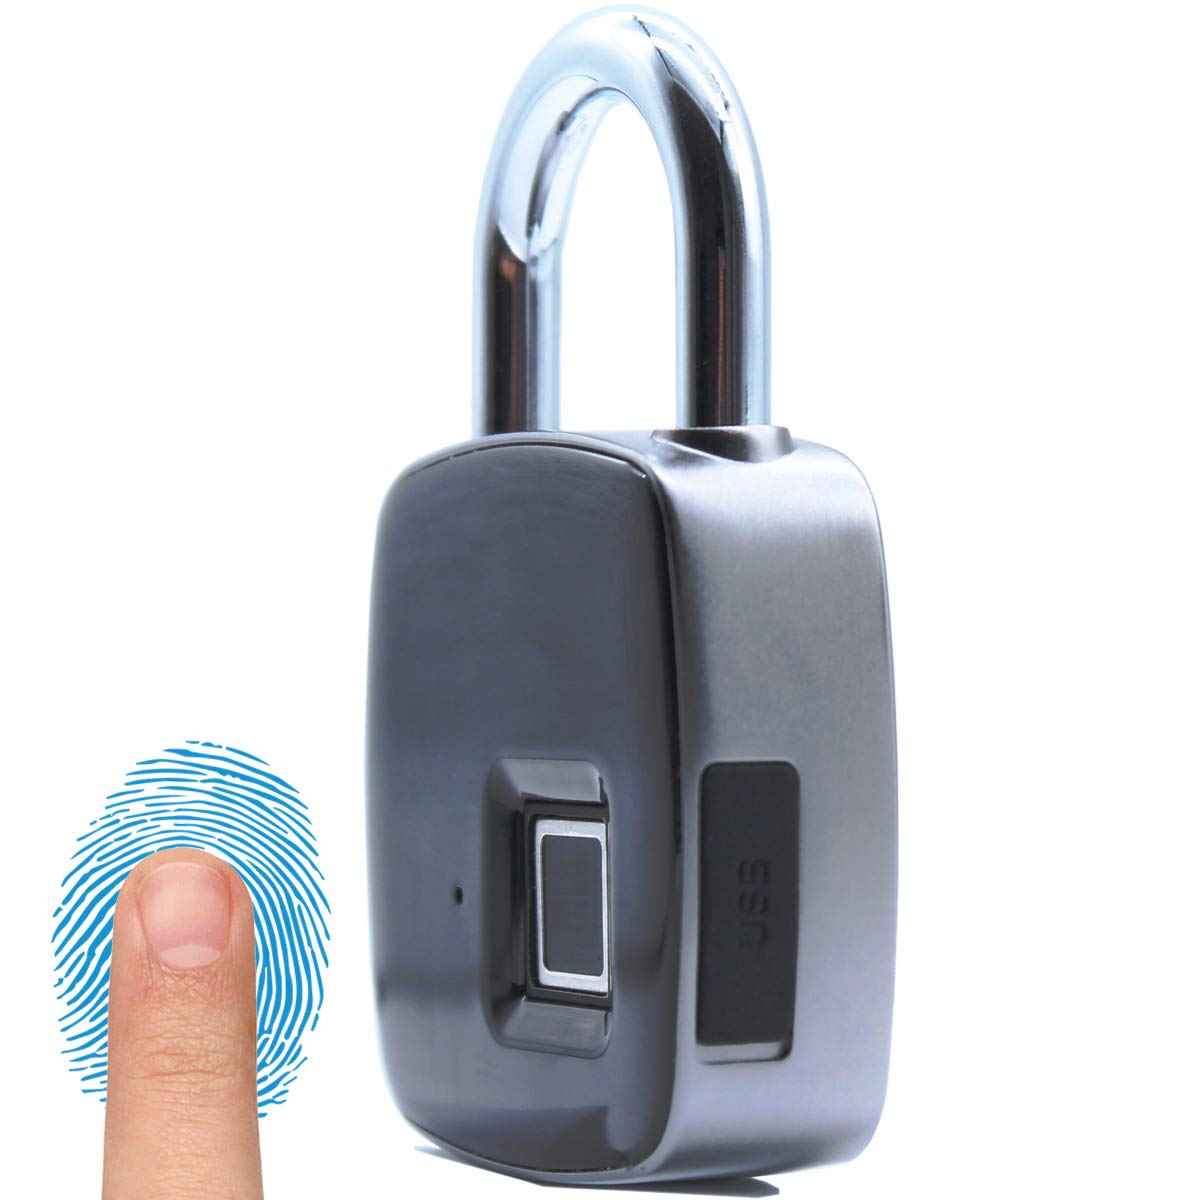 Dontz Smart Fingerprint Padlock, Portable Waterproof Travel Locks Without Key, Metal Structure Without Bluetooth, Support 10 Groups Fingerprint I.D, Backpack, Bike, Luggage, Gym Cabinet- USB Charging